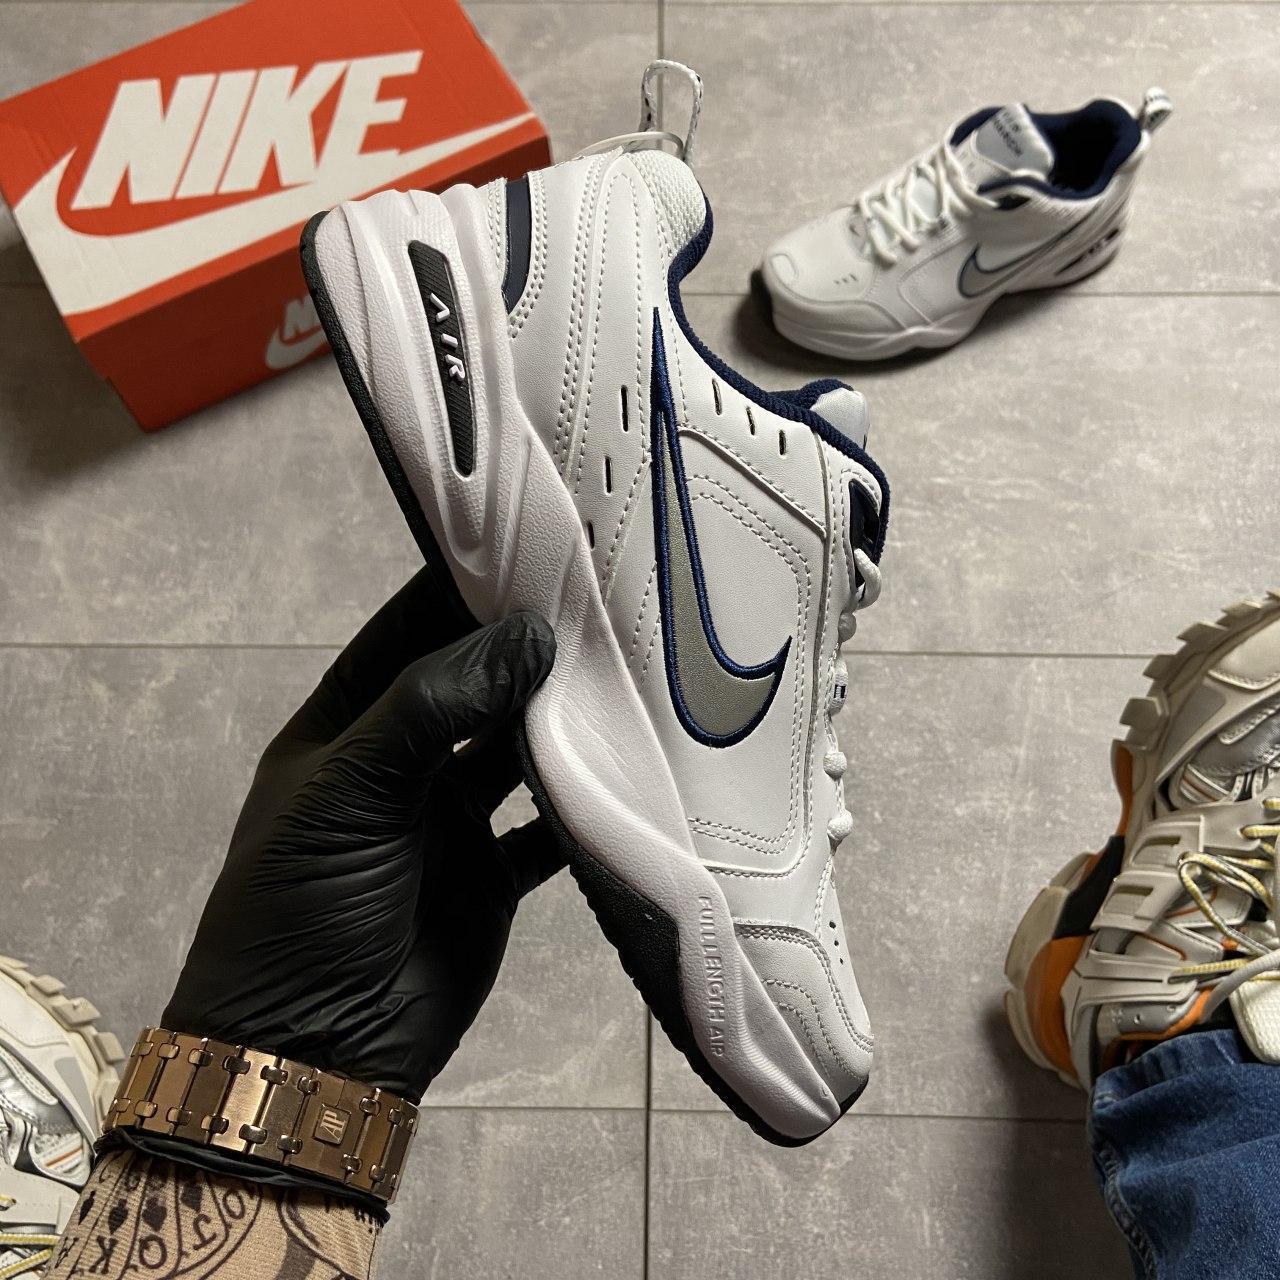 Кроссовки Nike Air Monarch White Blue Найк Эир Монарх Кожа Белый 🔥 Найк мужские кроссовки 🔥